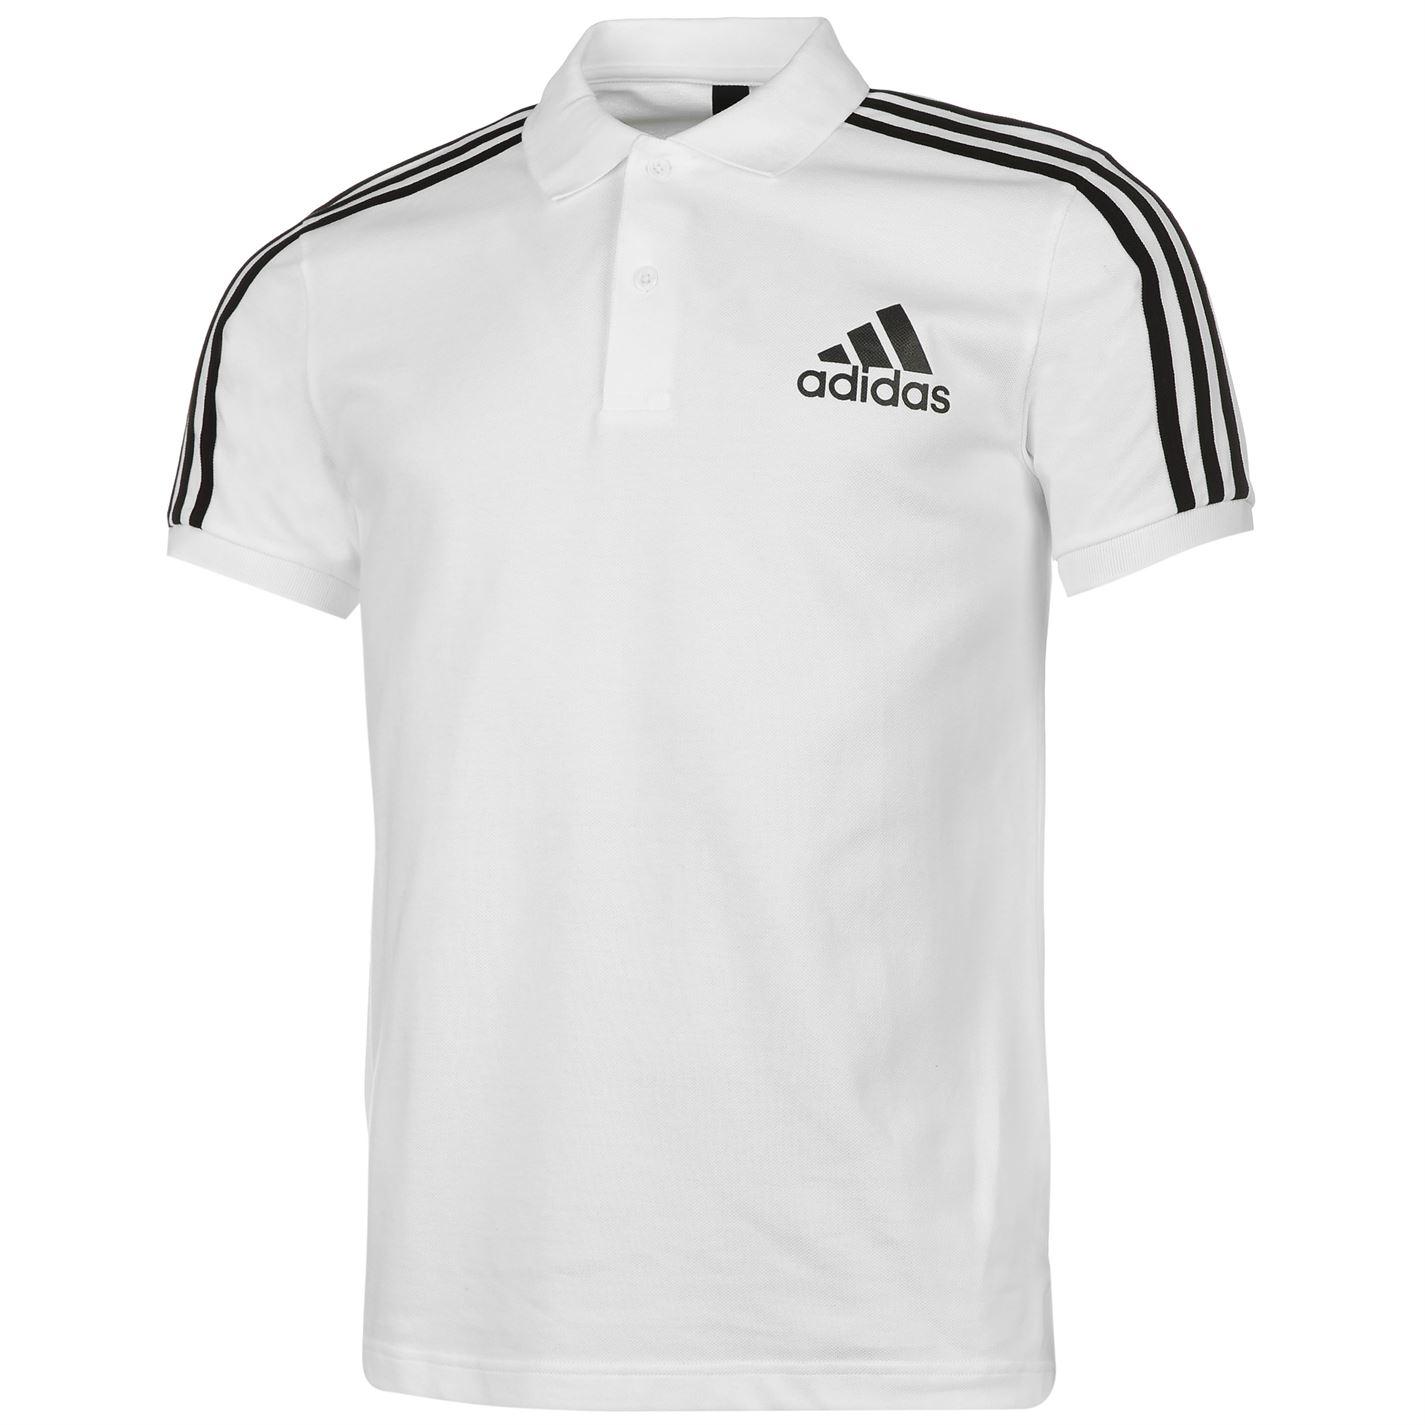 d9a636435a4 adidas Mens 3 Stripes Logo Polo Shirt Tee Top Cotton Print Casual ...